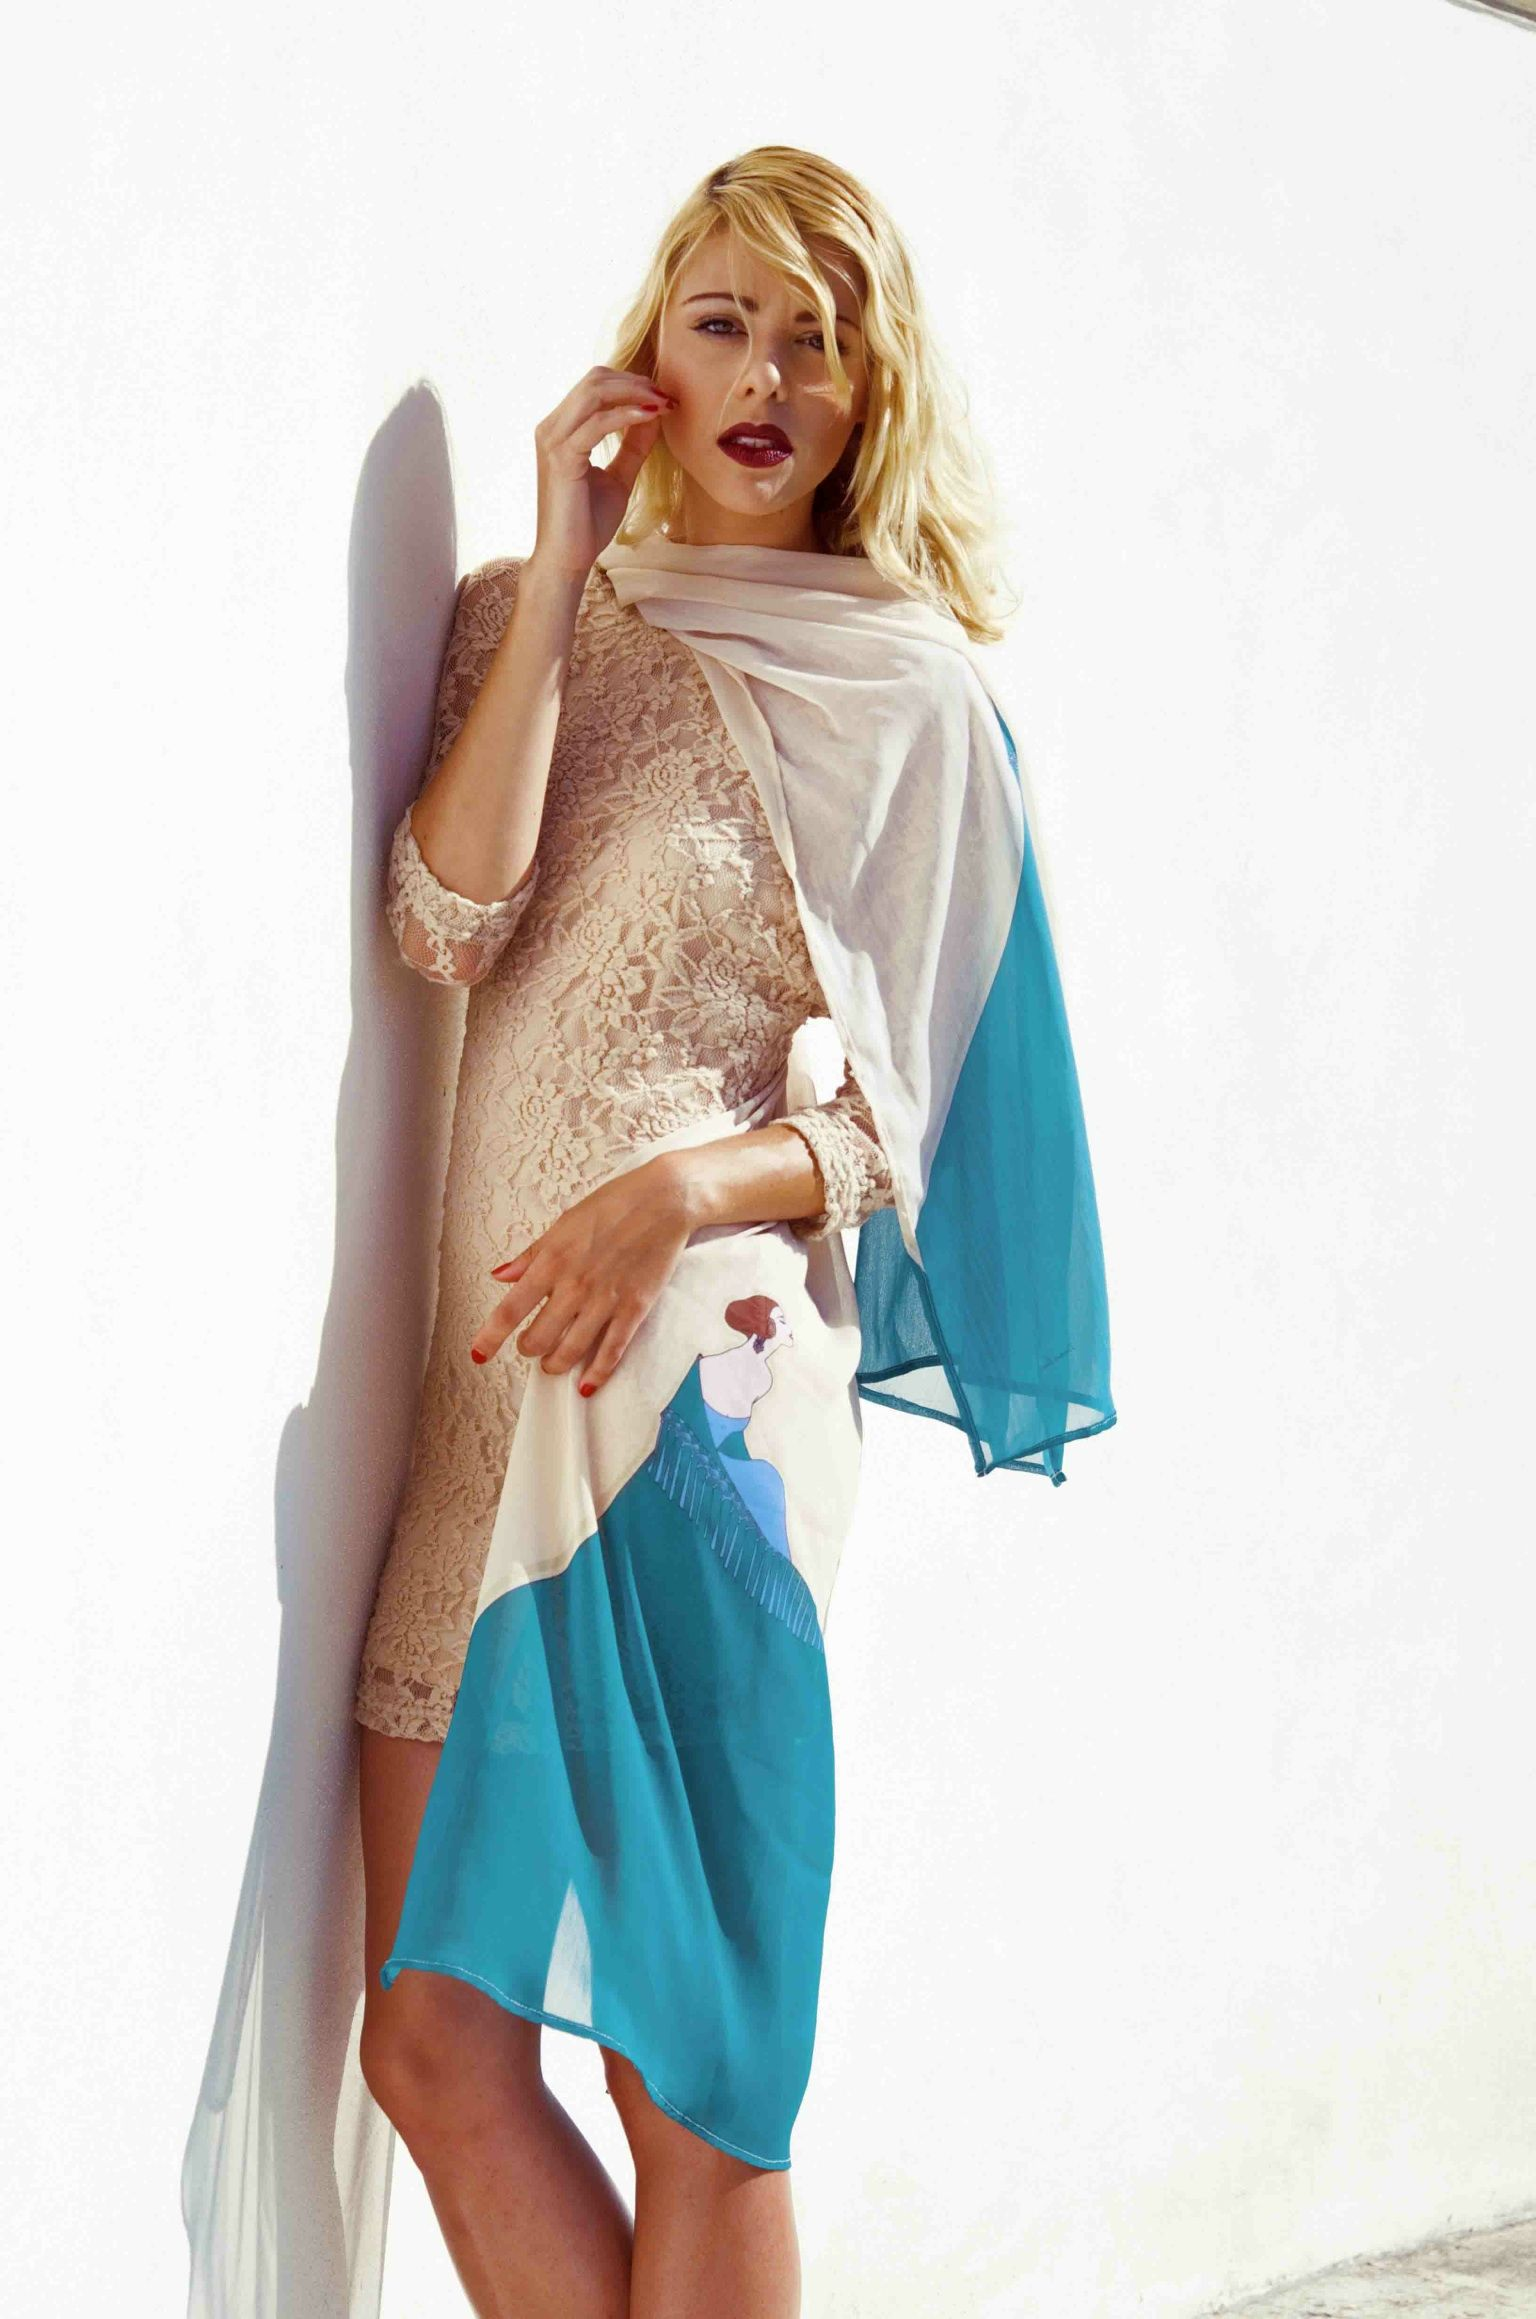 Green fadista shawl | lenço fadista verde disponível por encomenda em info@lipscani.pt ou www.lipscani.pt